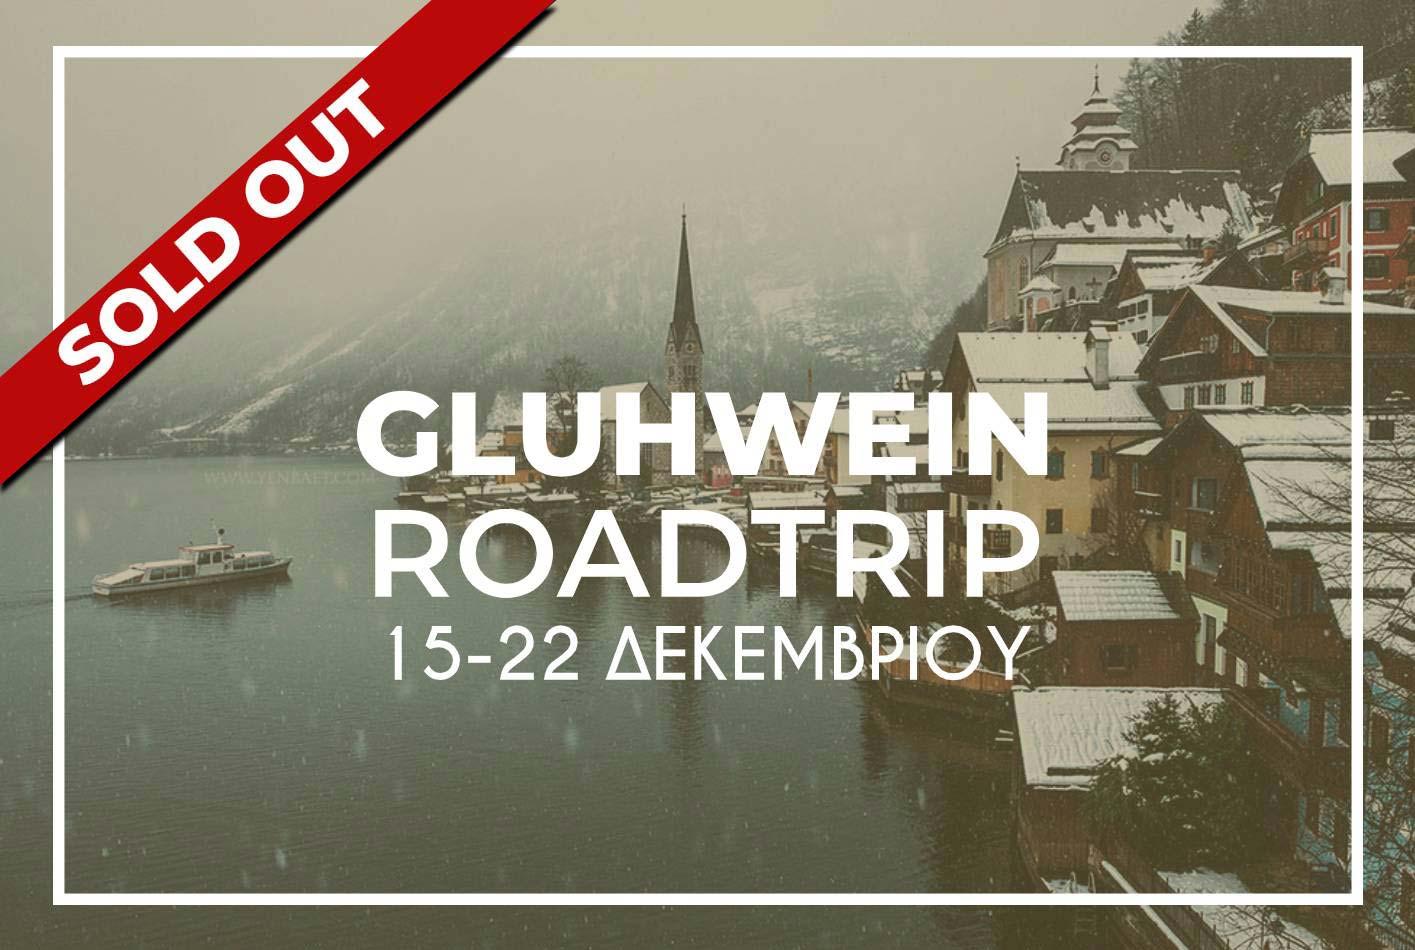 Gluhwein Roadtrip Sold out